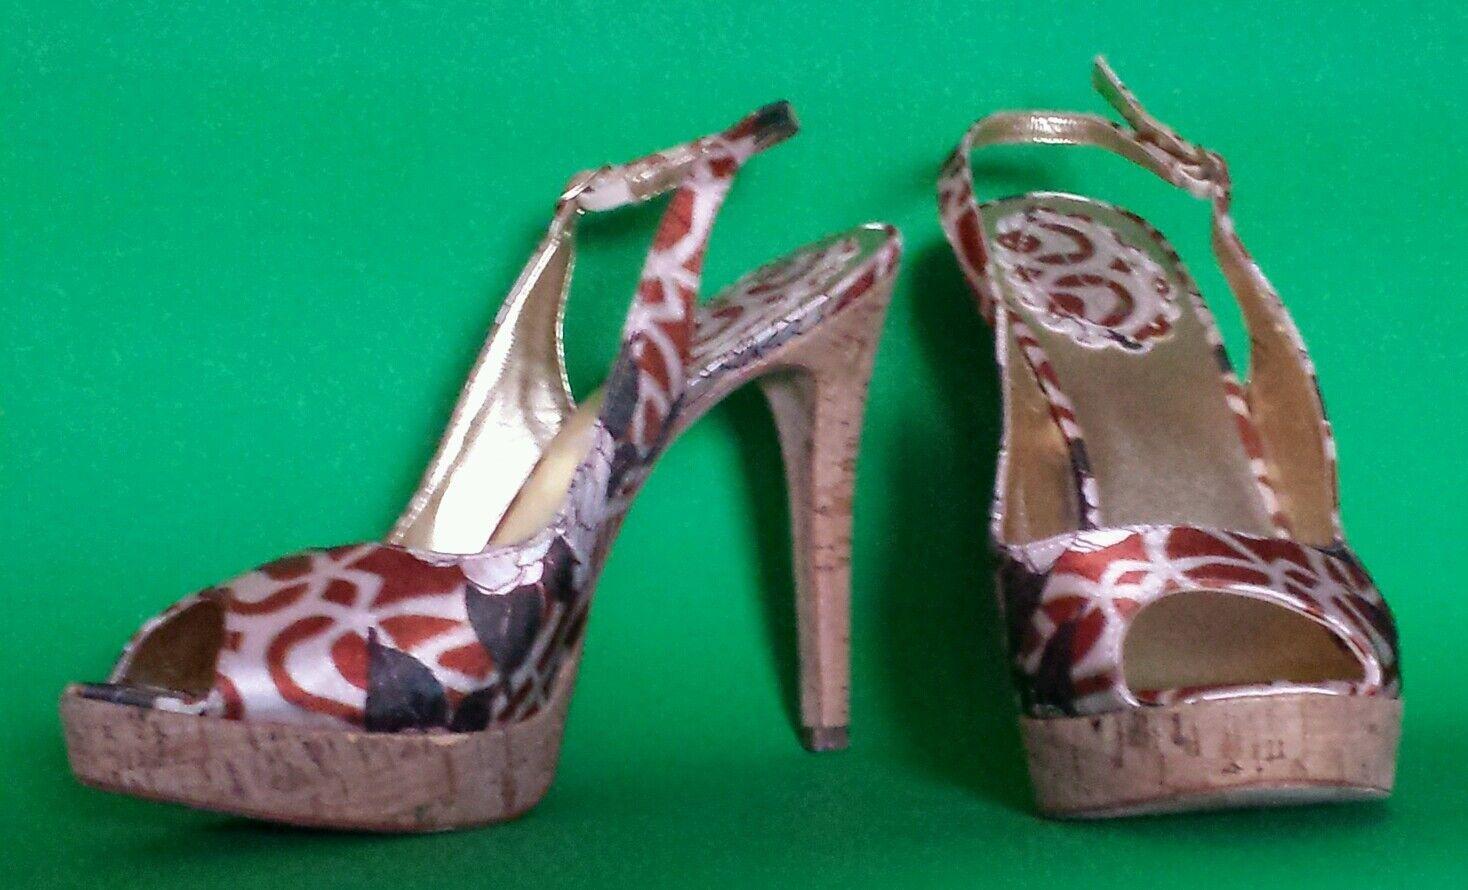 ALDO Open Toe Cork Heel Floral Abstract Satin Slingbacks Heels Leather Sole 9B